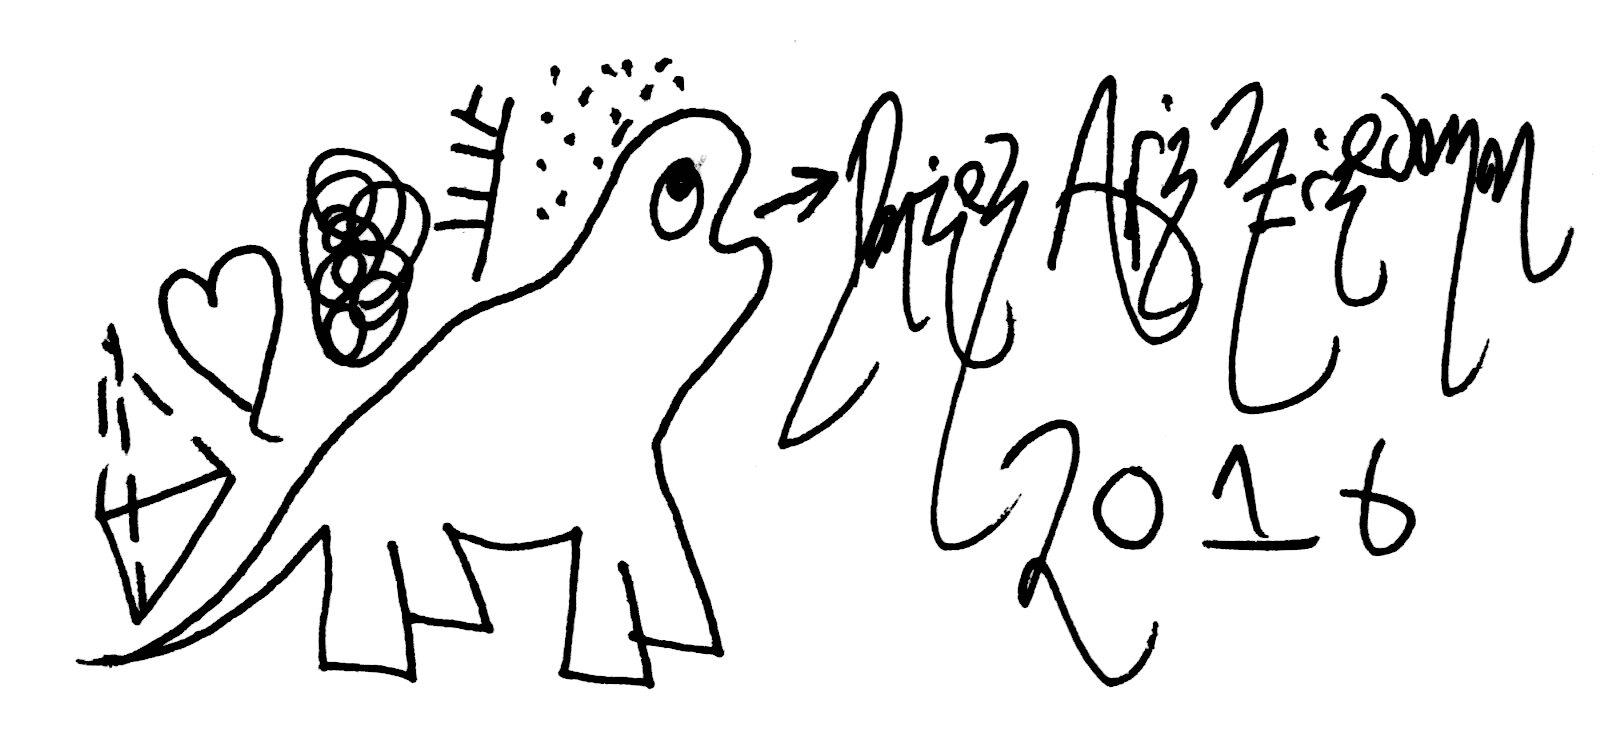 danielarifriedman's Signature